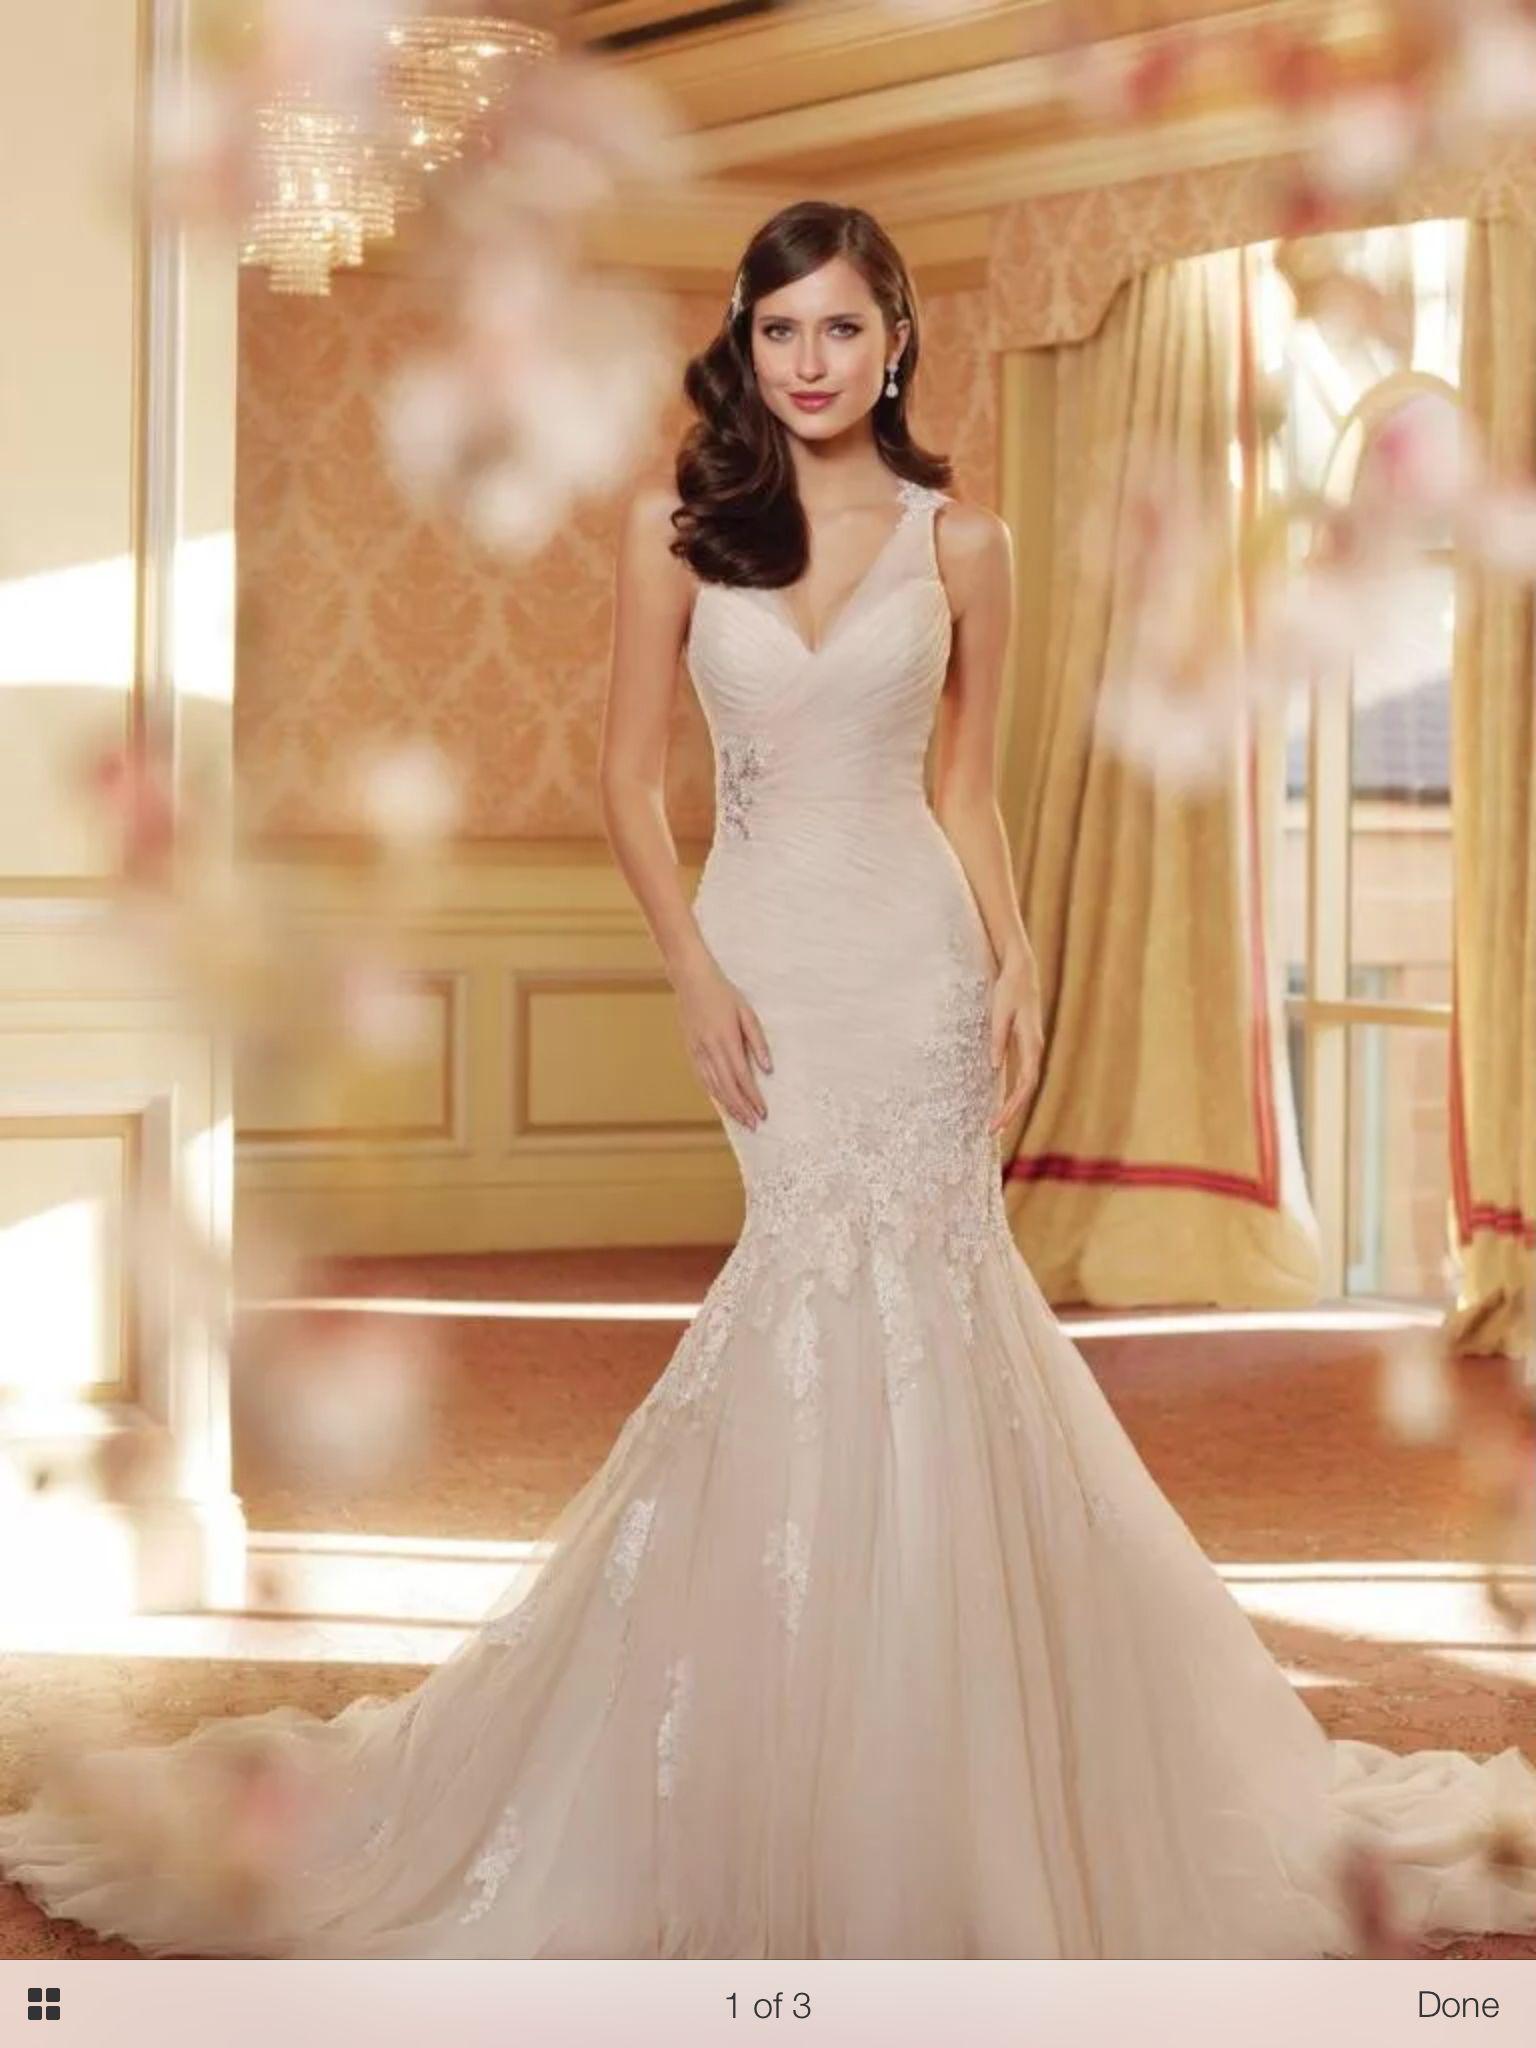 Pin by jo jackson on bridal pinterest wedding dress and wedding